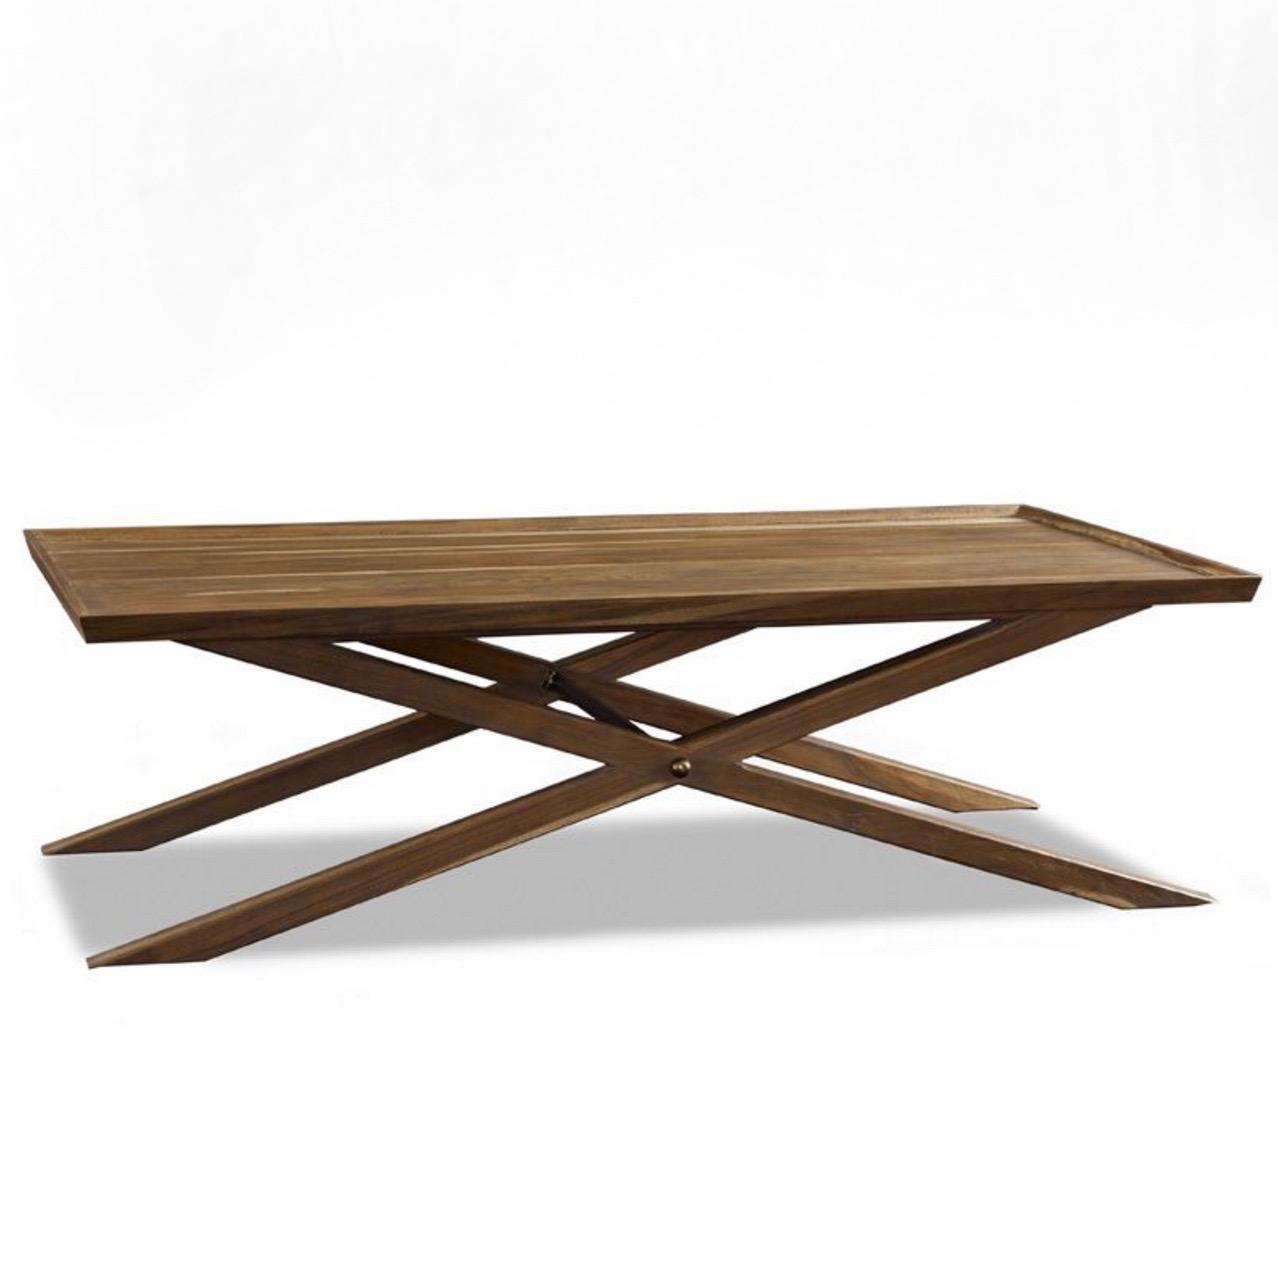 crawford x base coffee table newport coast interior design. Black Bedroom Furniture Sets. Home Design Ideas